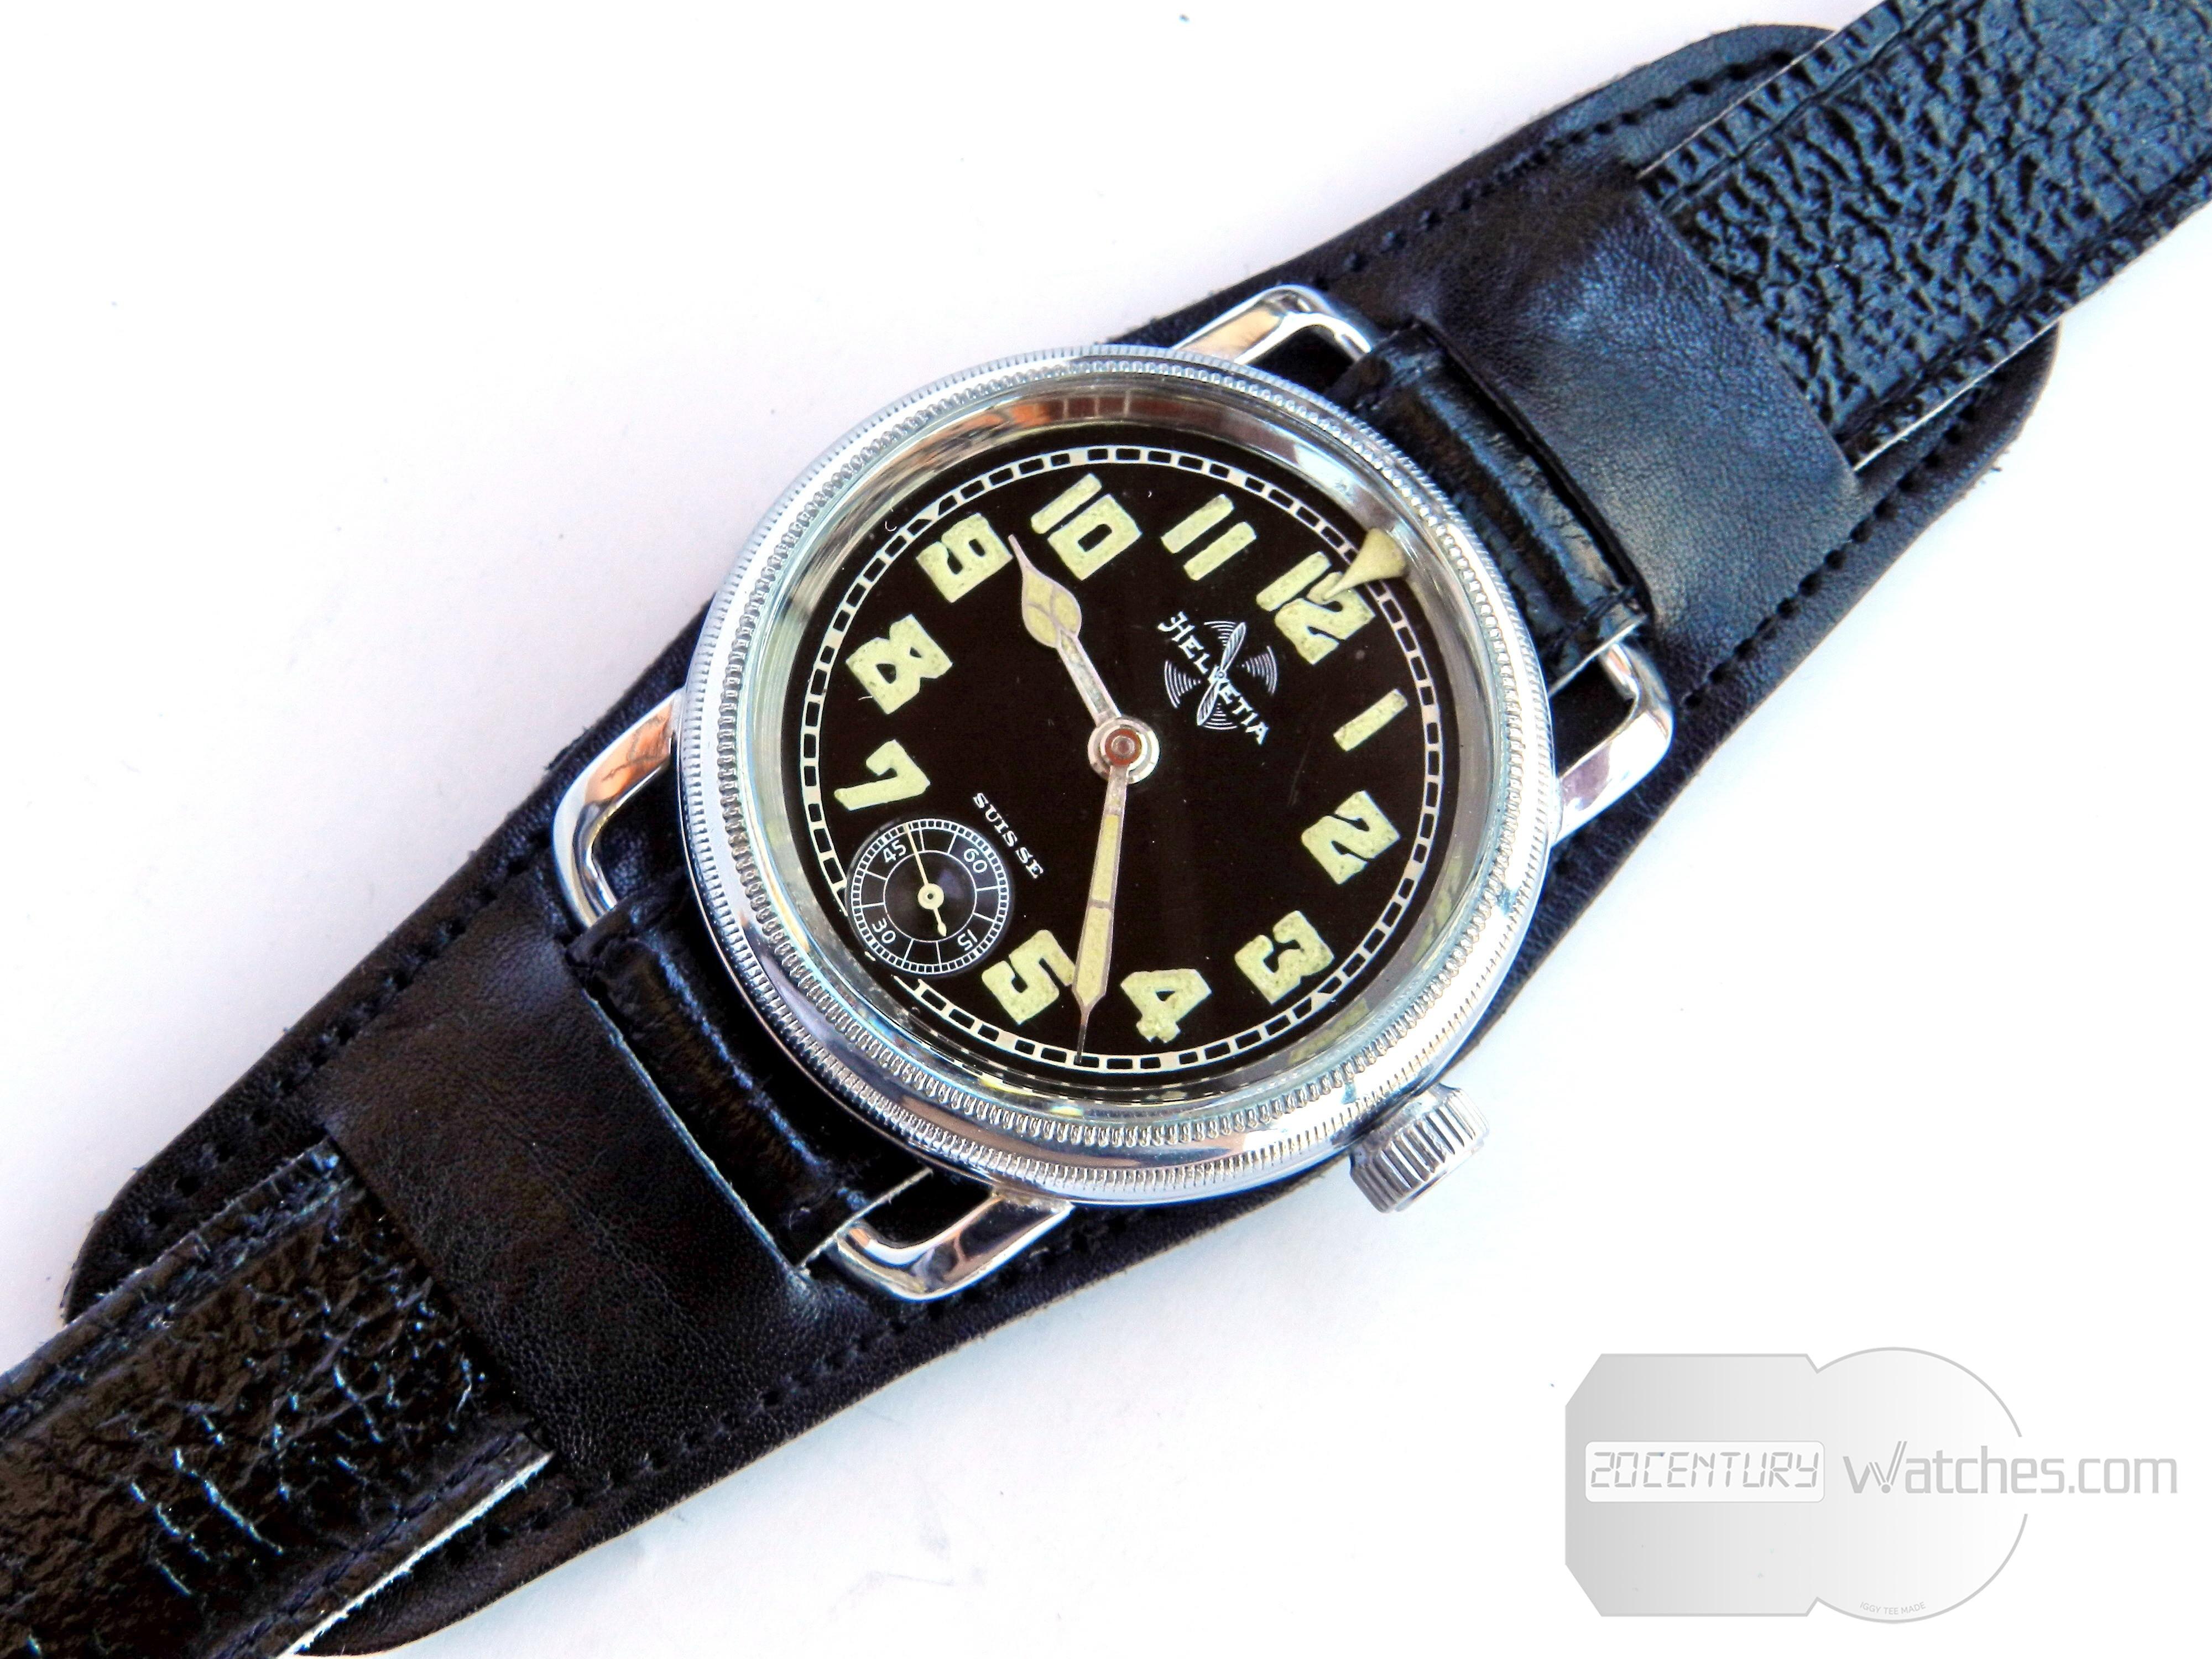 Helvetia pilot watch